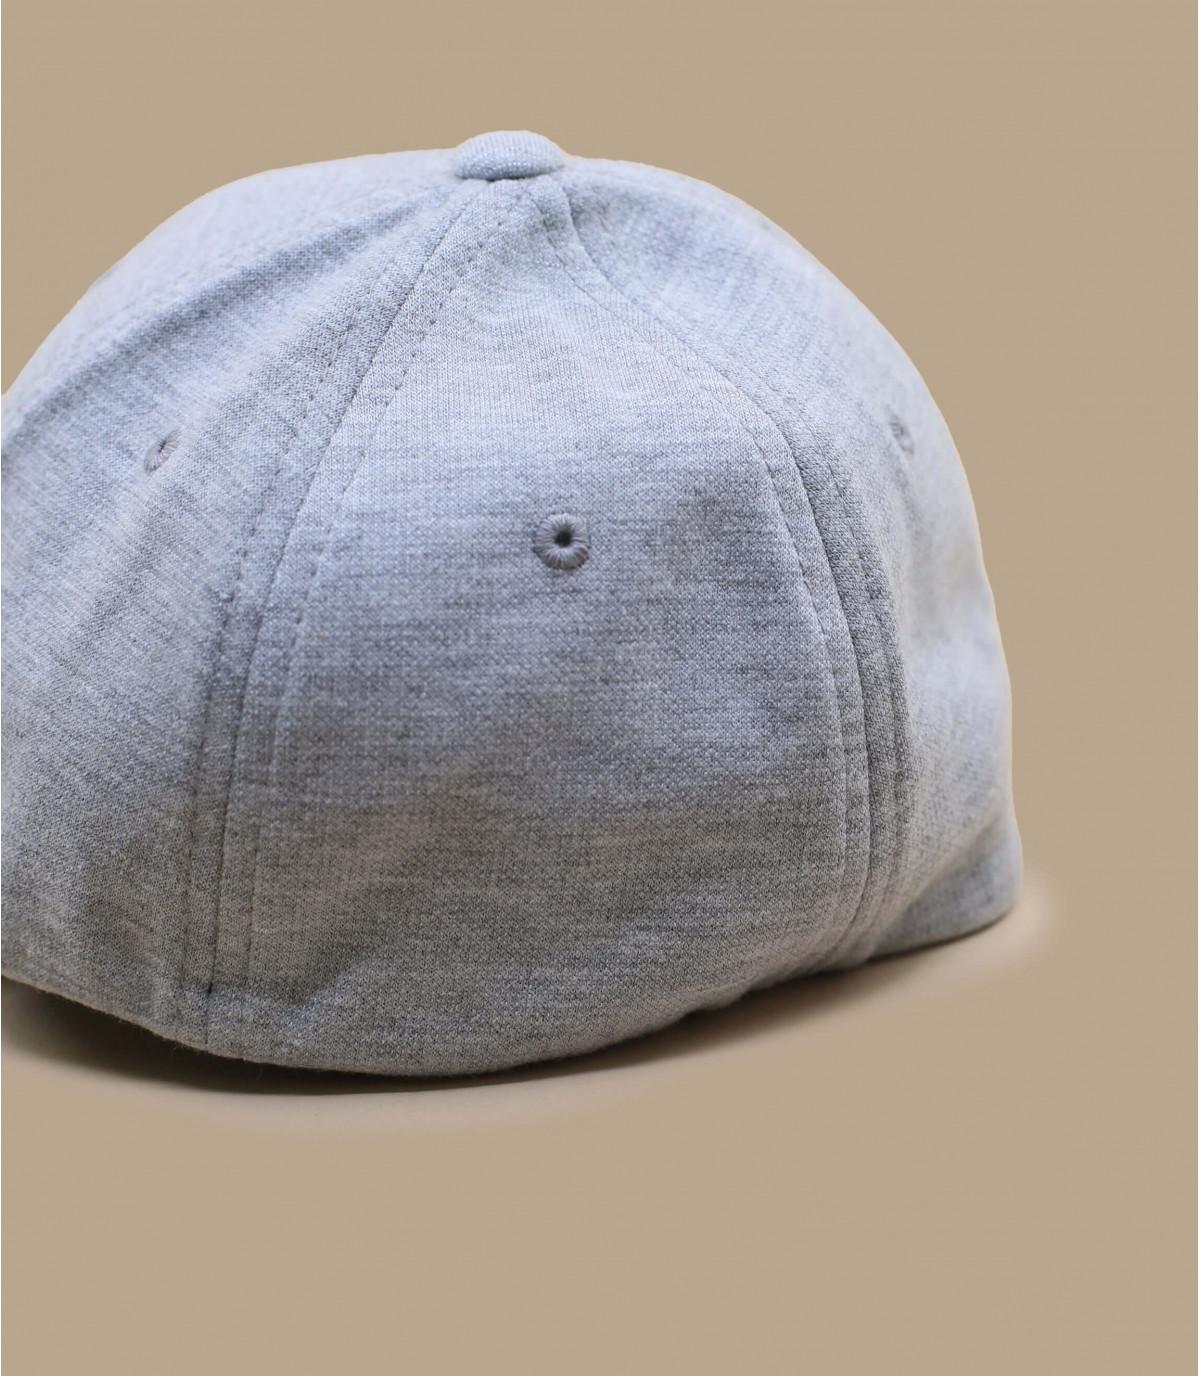 Detalles Gorra jersey gris imagen 3